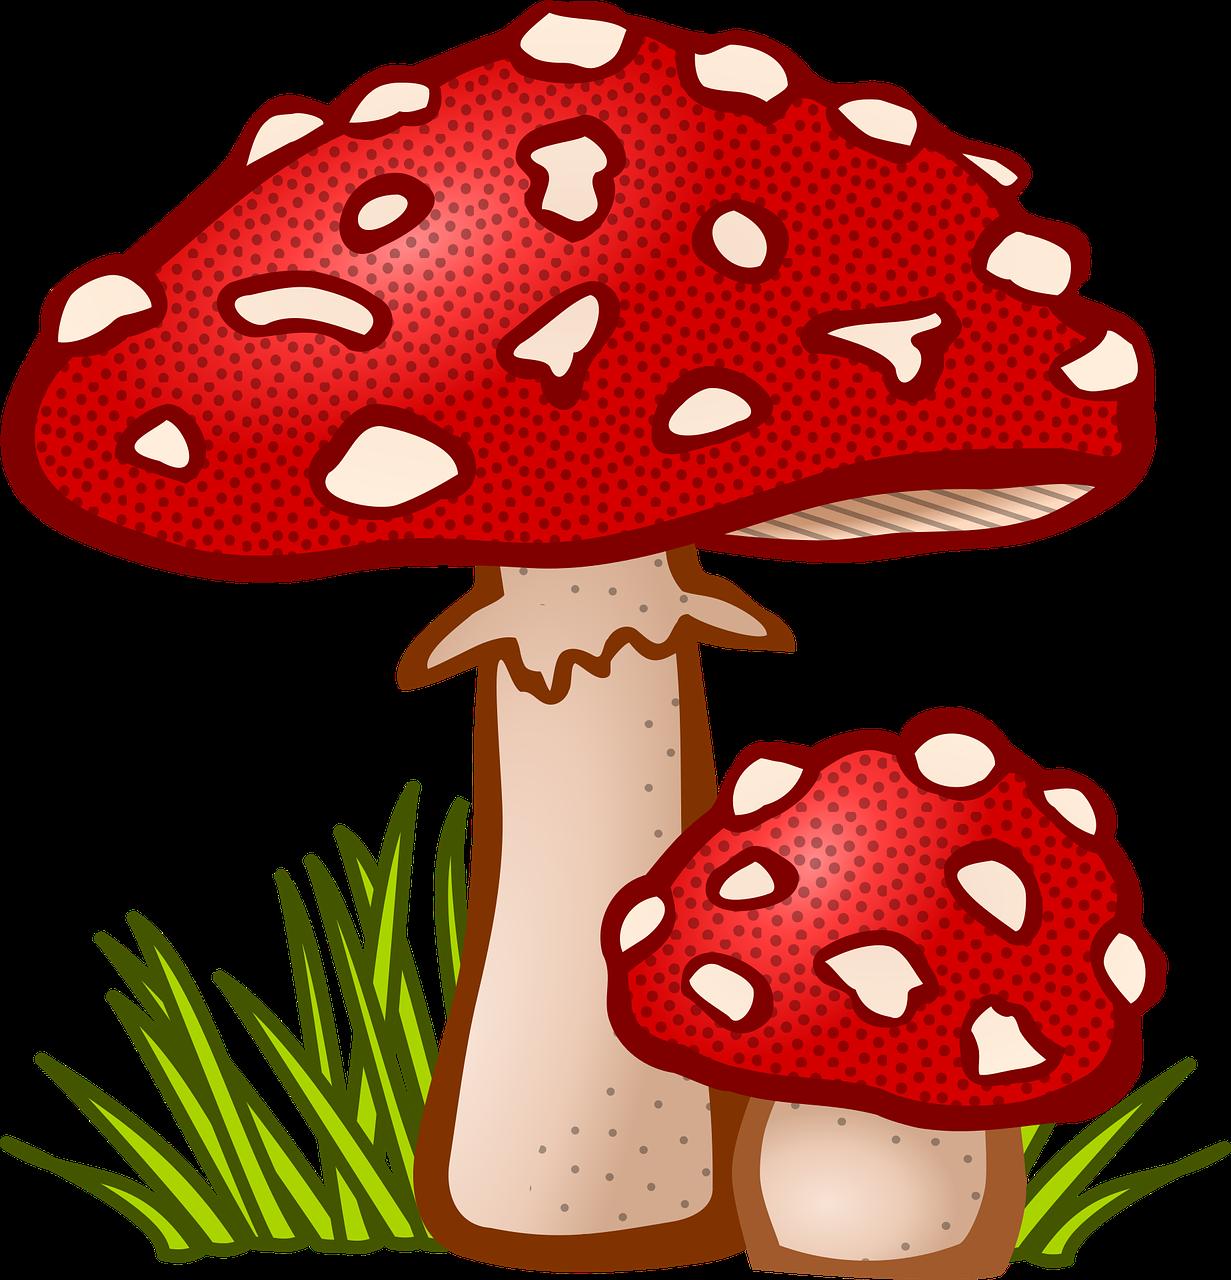 Gratis Obraz Na Pixabay Grzybicze Grzyb Roslin Muchomor Free Clip Art Stuffed Mushrooms Mushroom Art